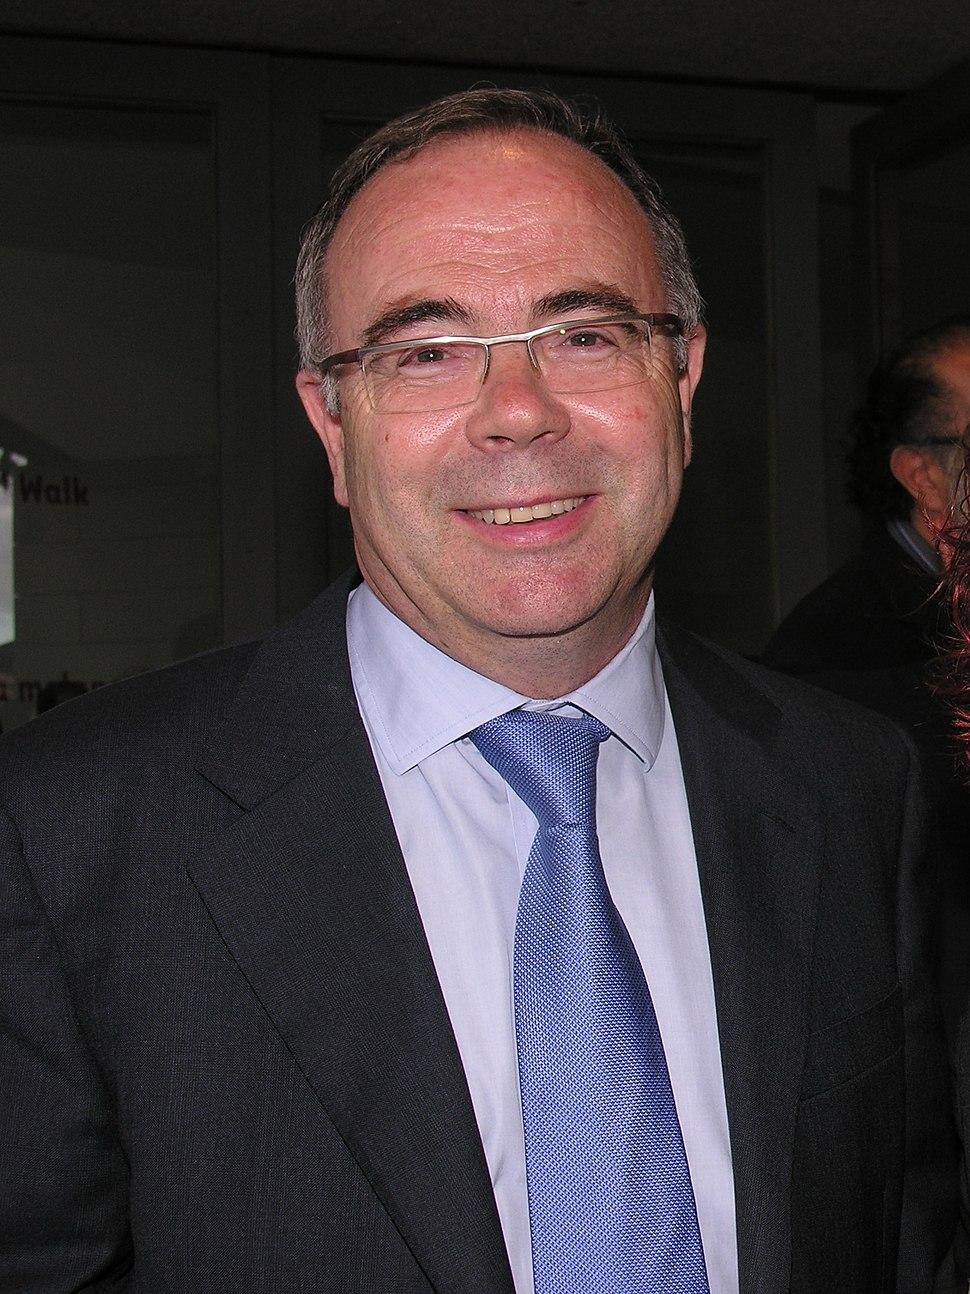 Xose Antonio Sanchez Bugallo